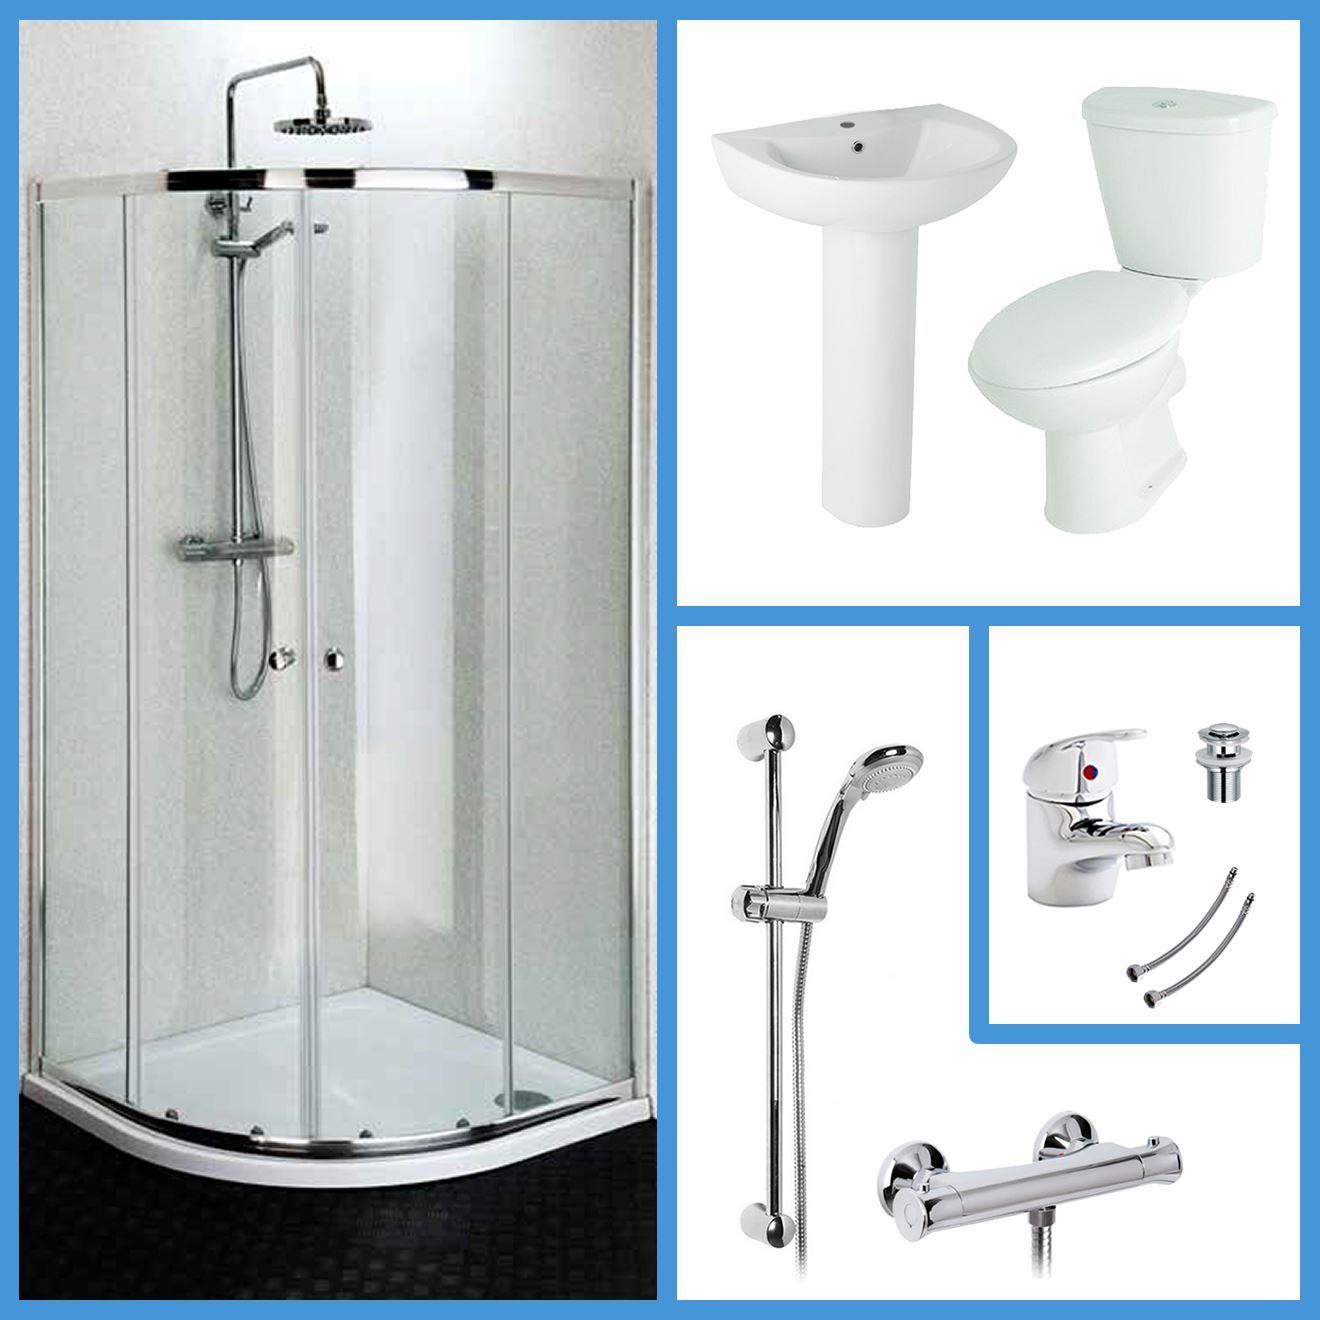 Bathroom suites with shower enclosures - 1200x800 Quadrant Shower Enclosure Basin Toilet Bathroom Suite